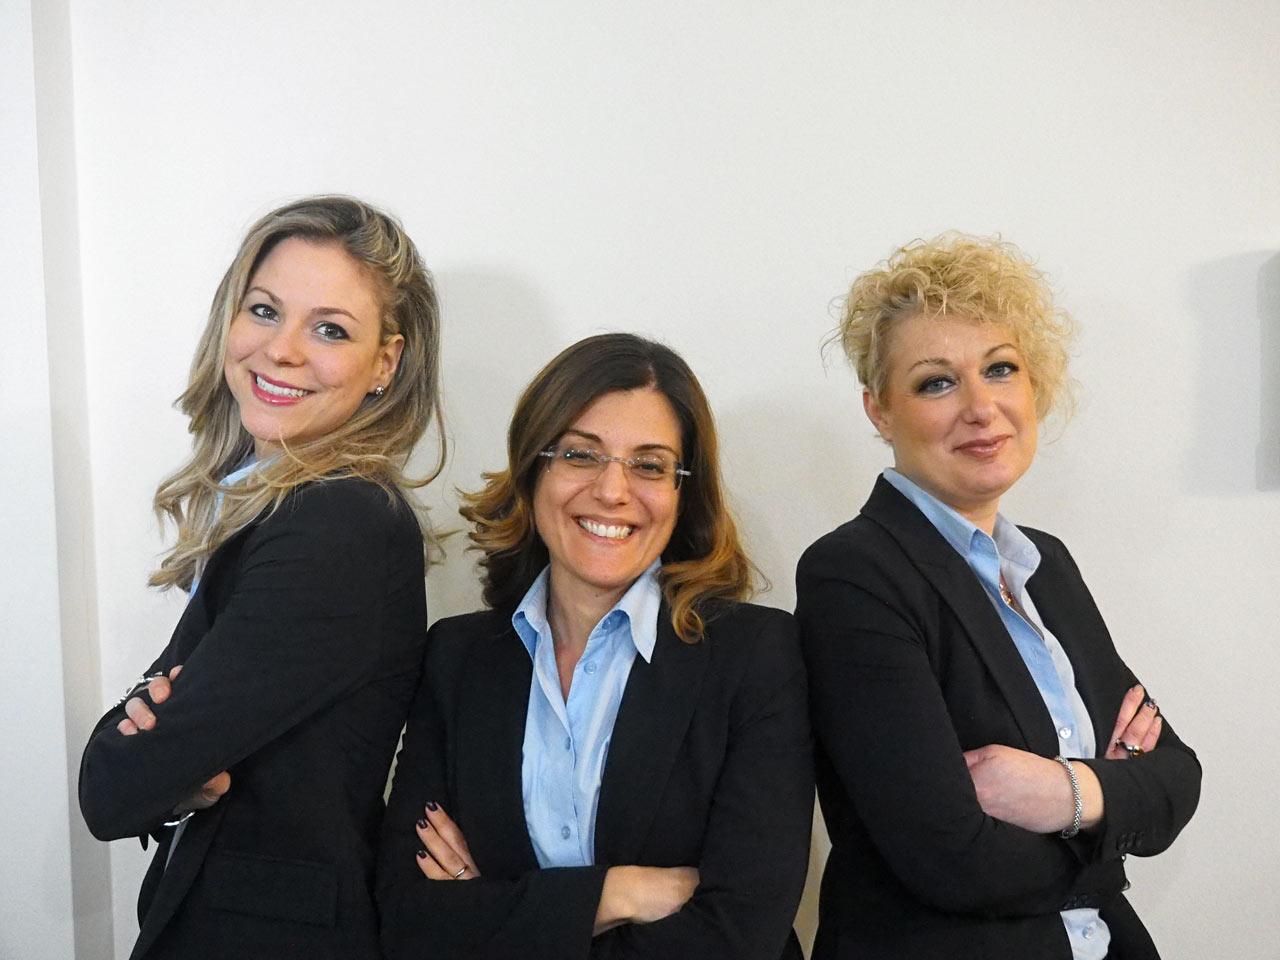 segretarie-stomatologico-Melzo-MILANO